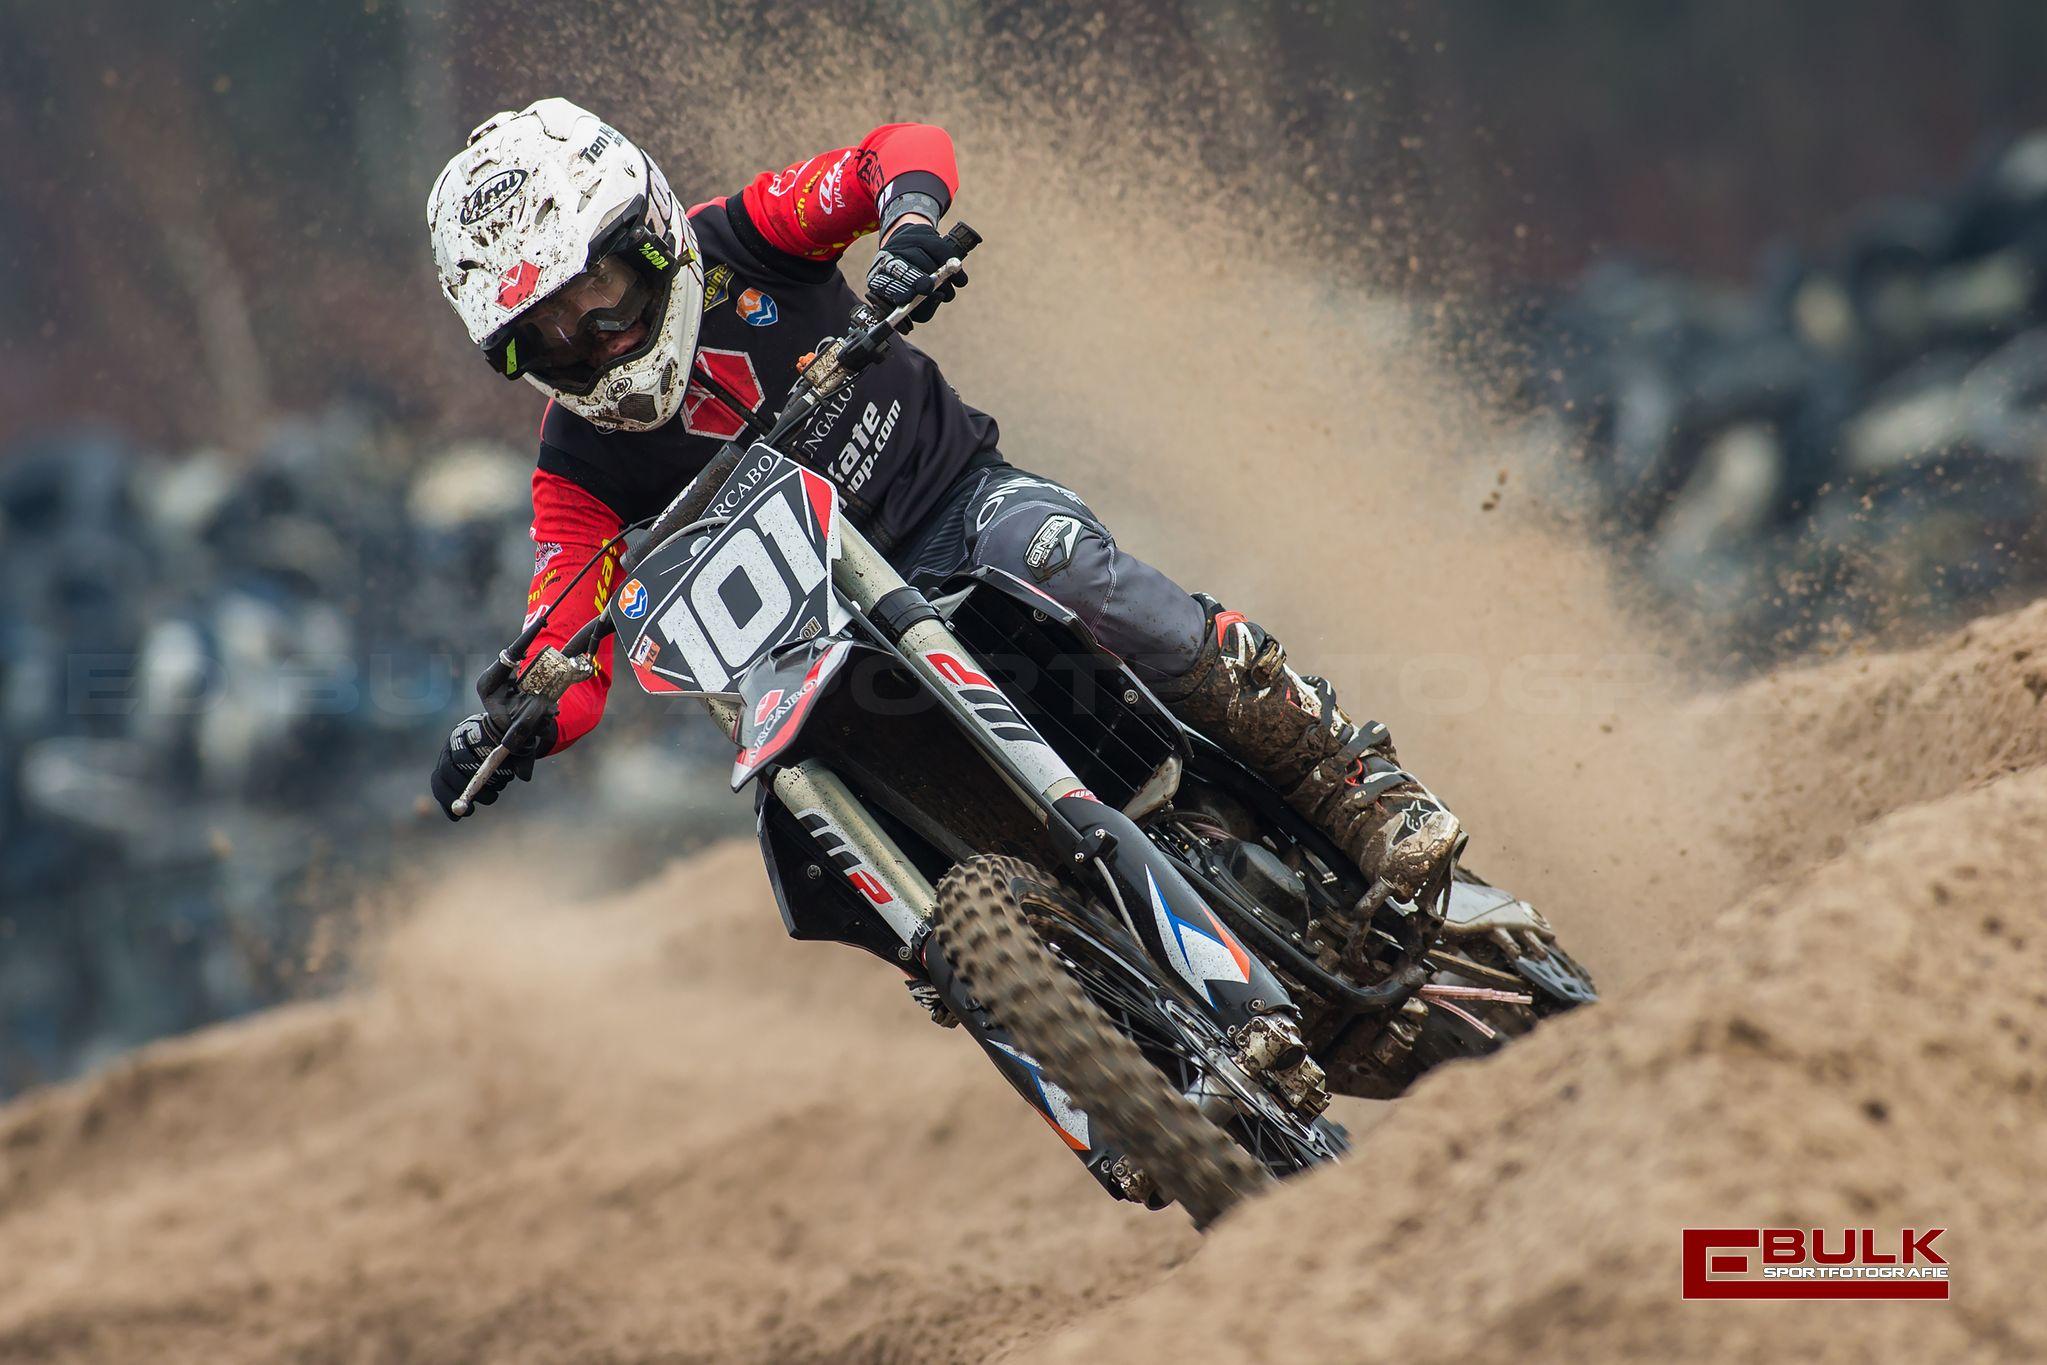 eebs0294-ed_bulk_sportfotografie